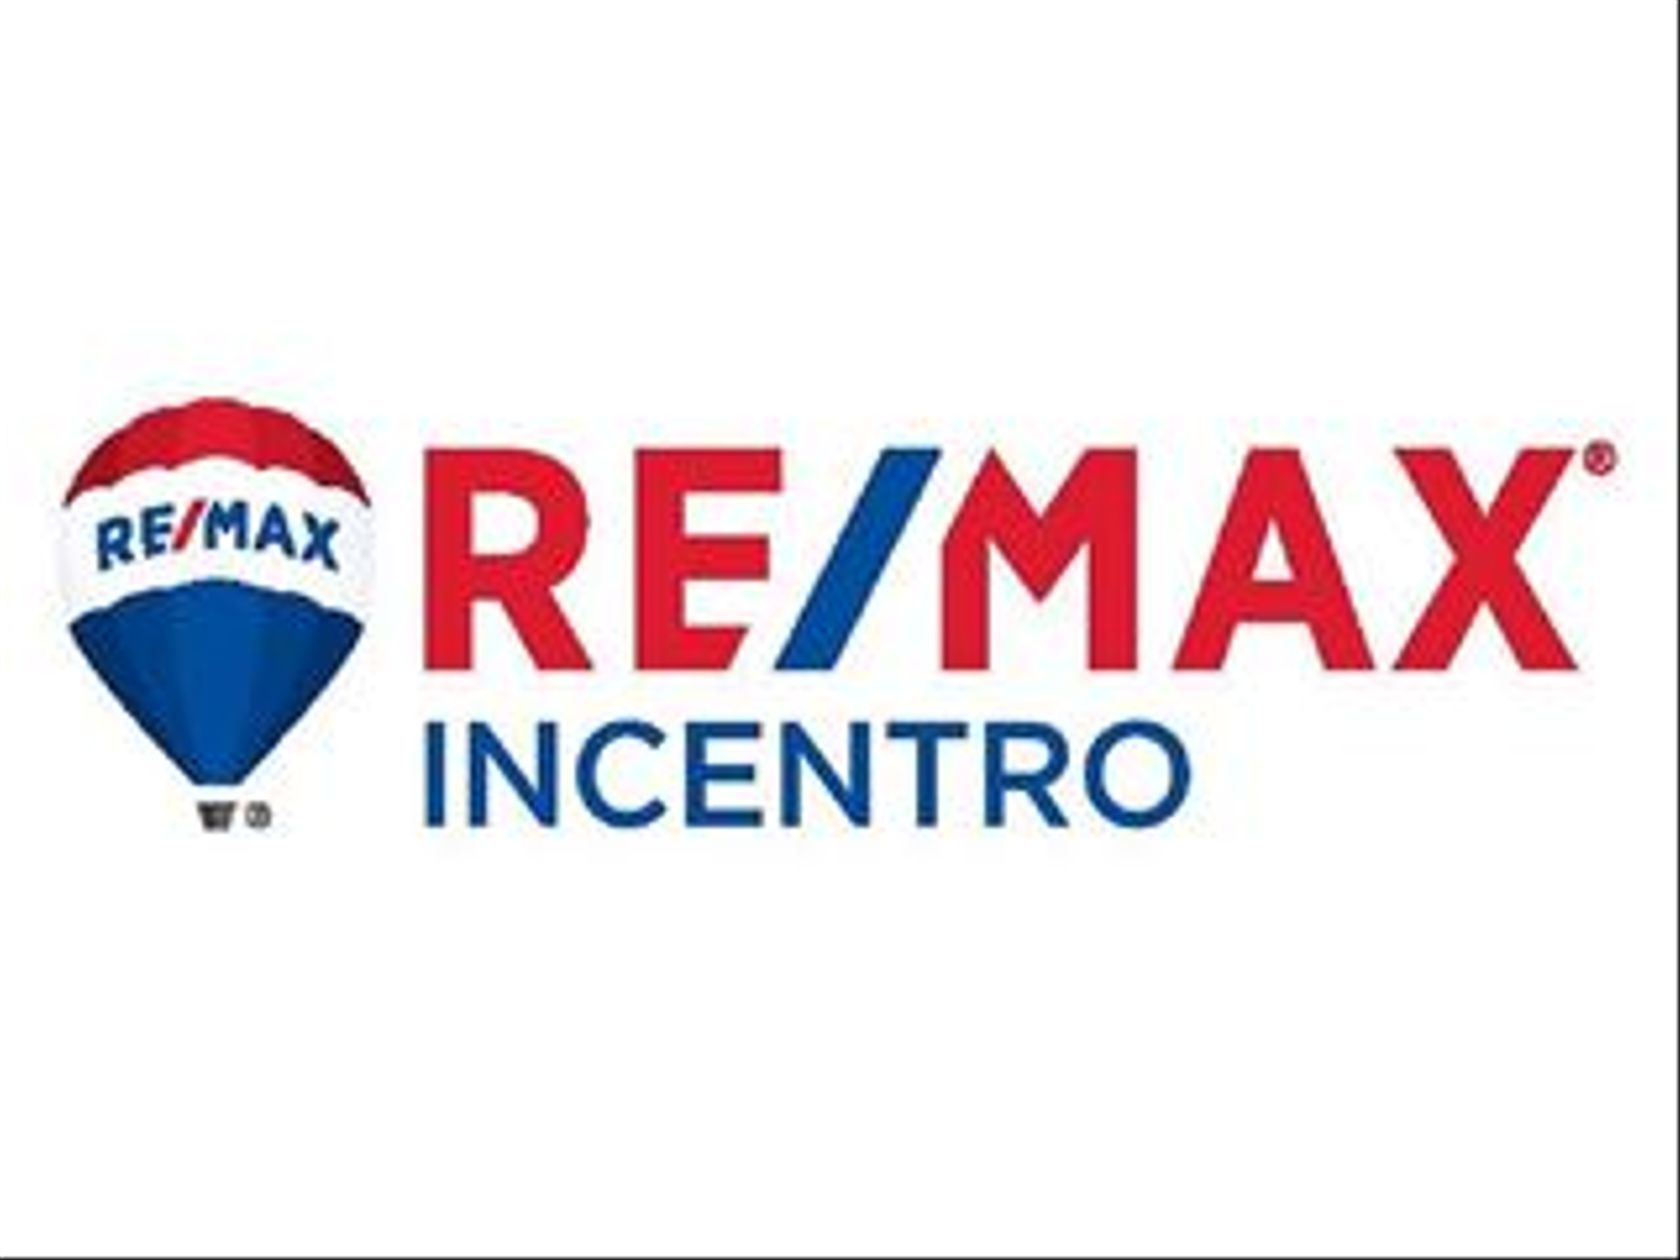 RE/MAX Incentro Salerno